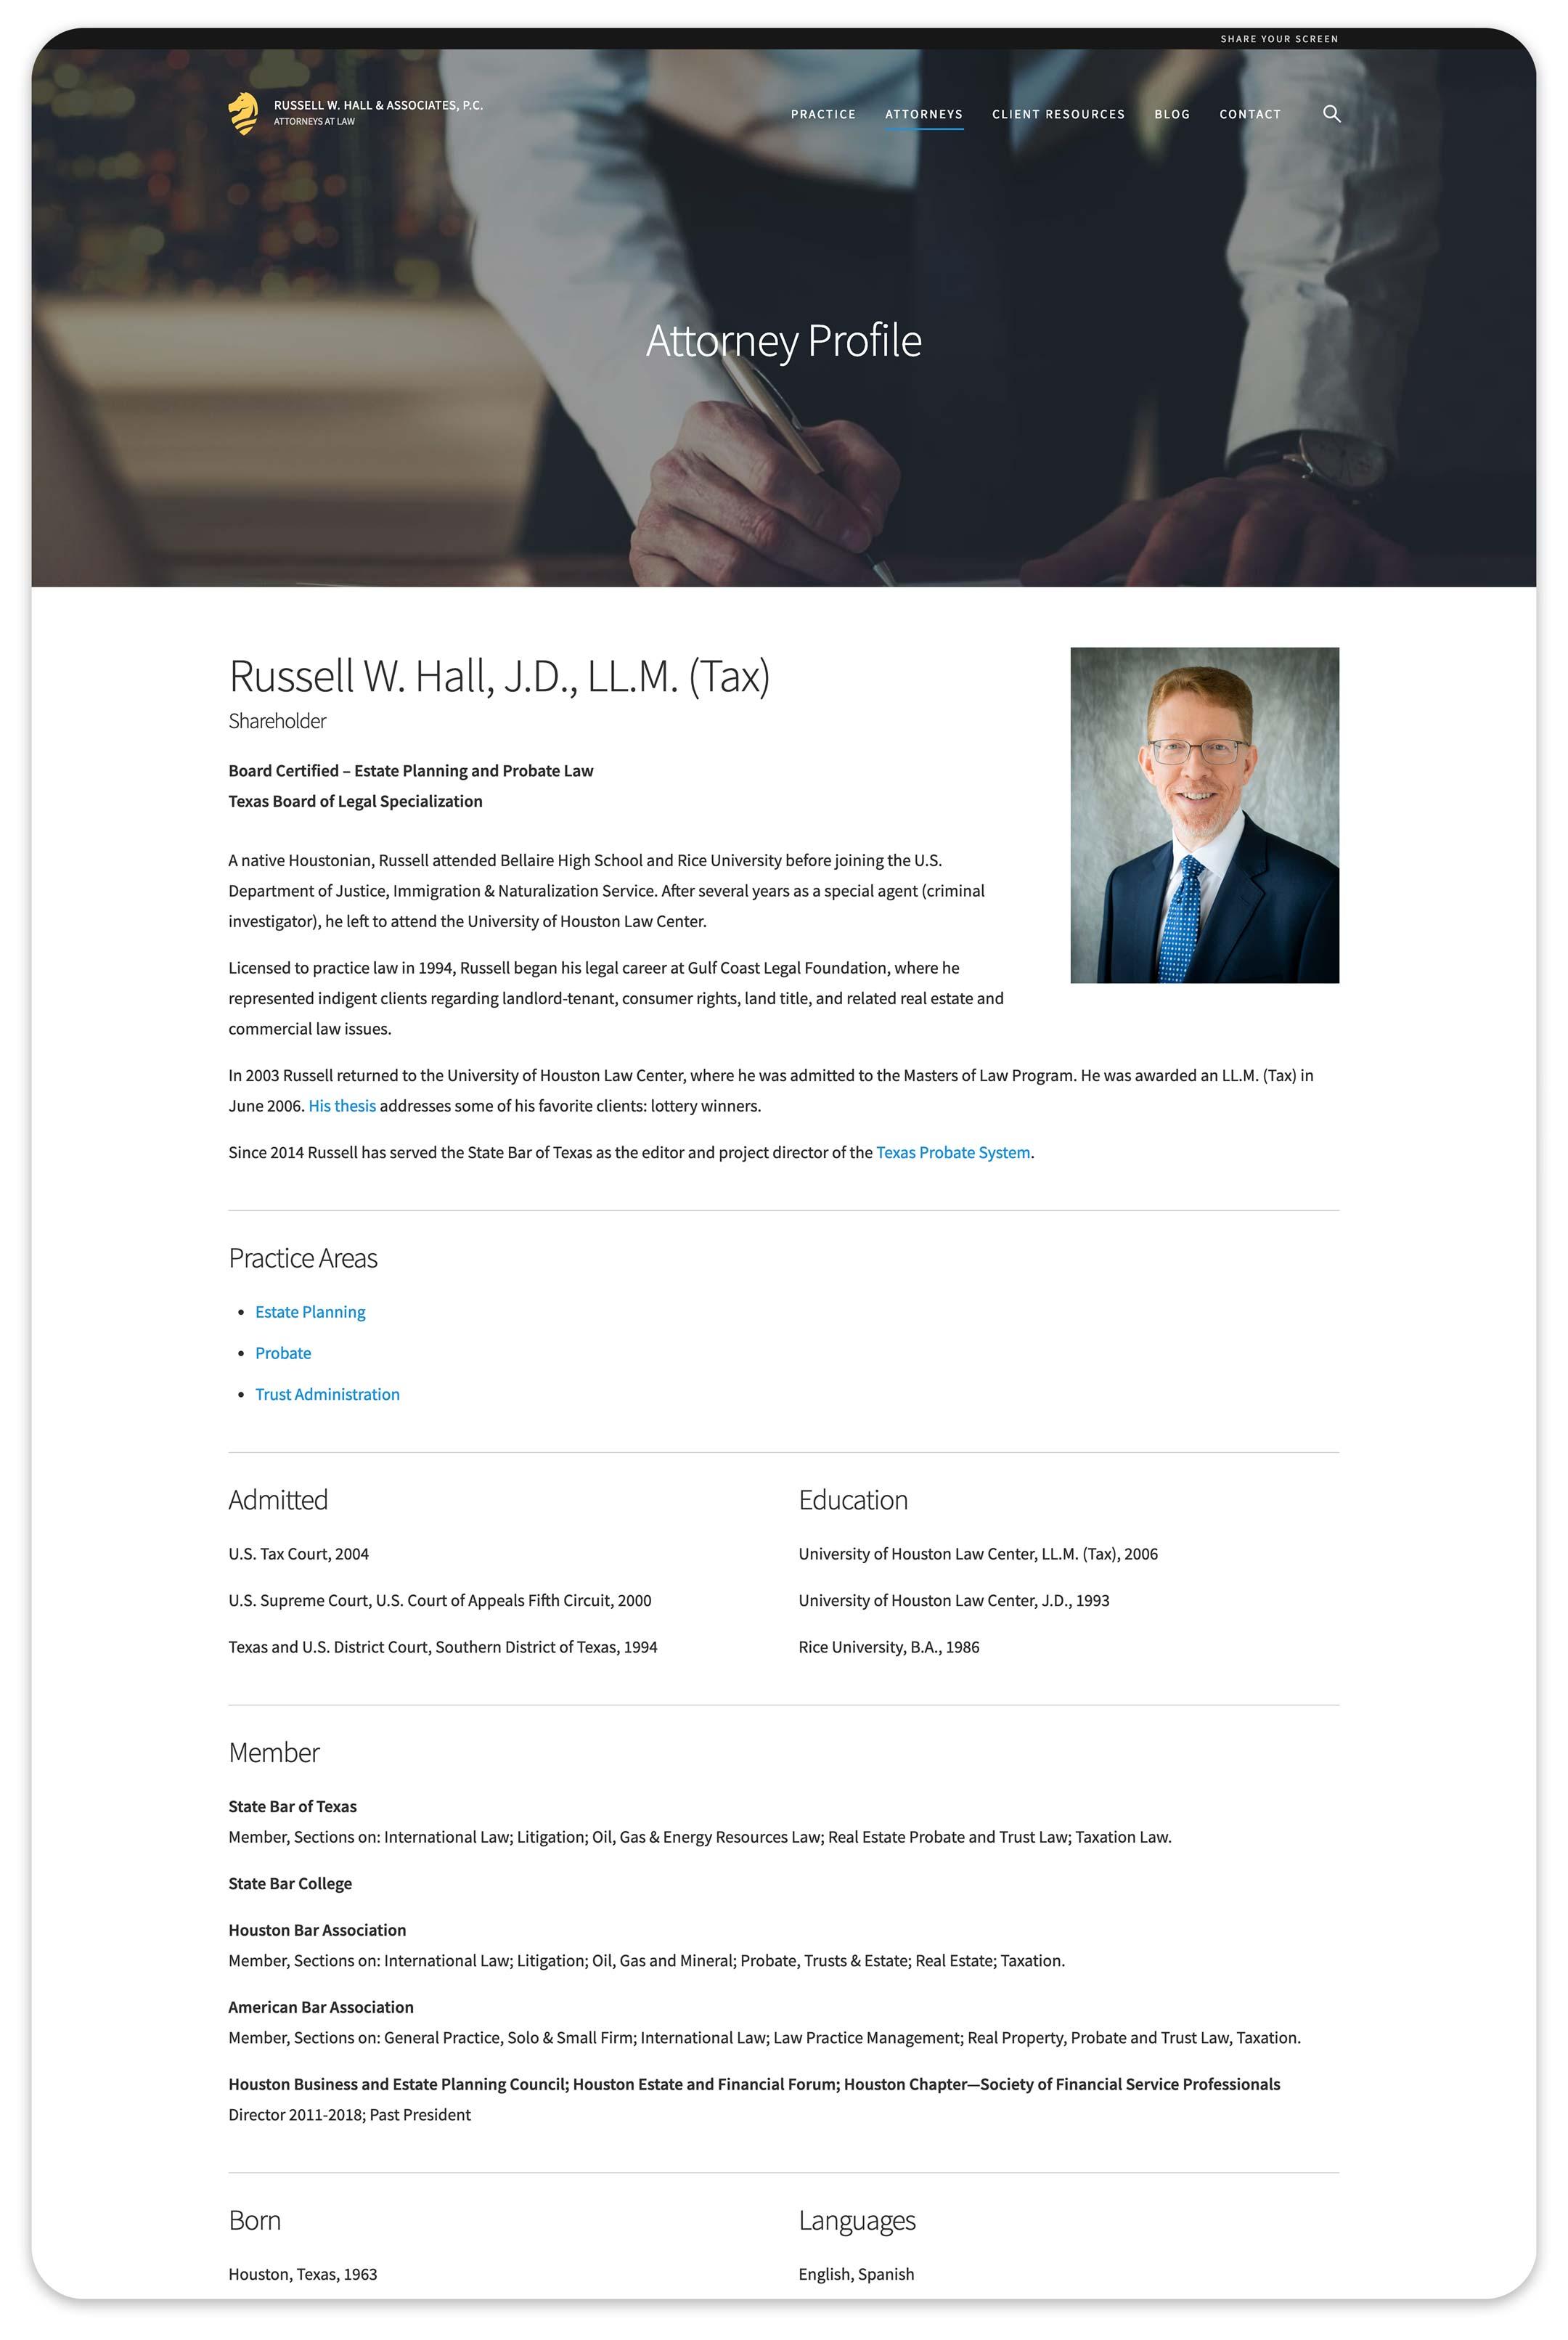 RWHPC attorney desktop